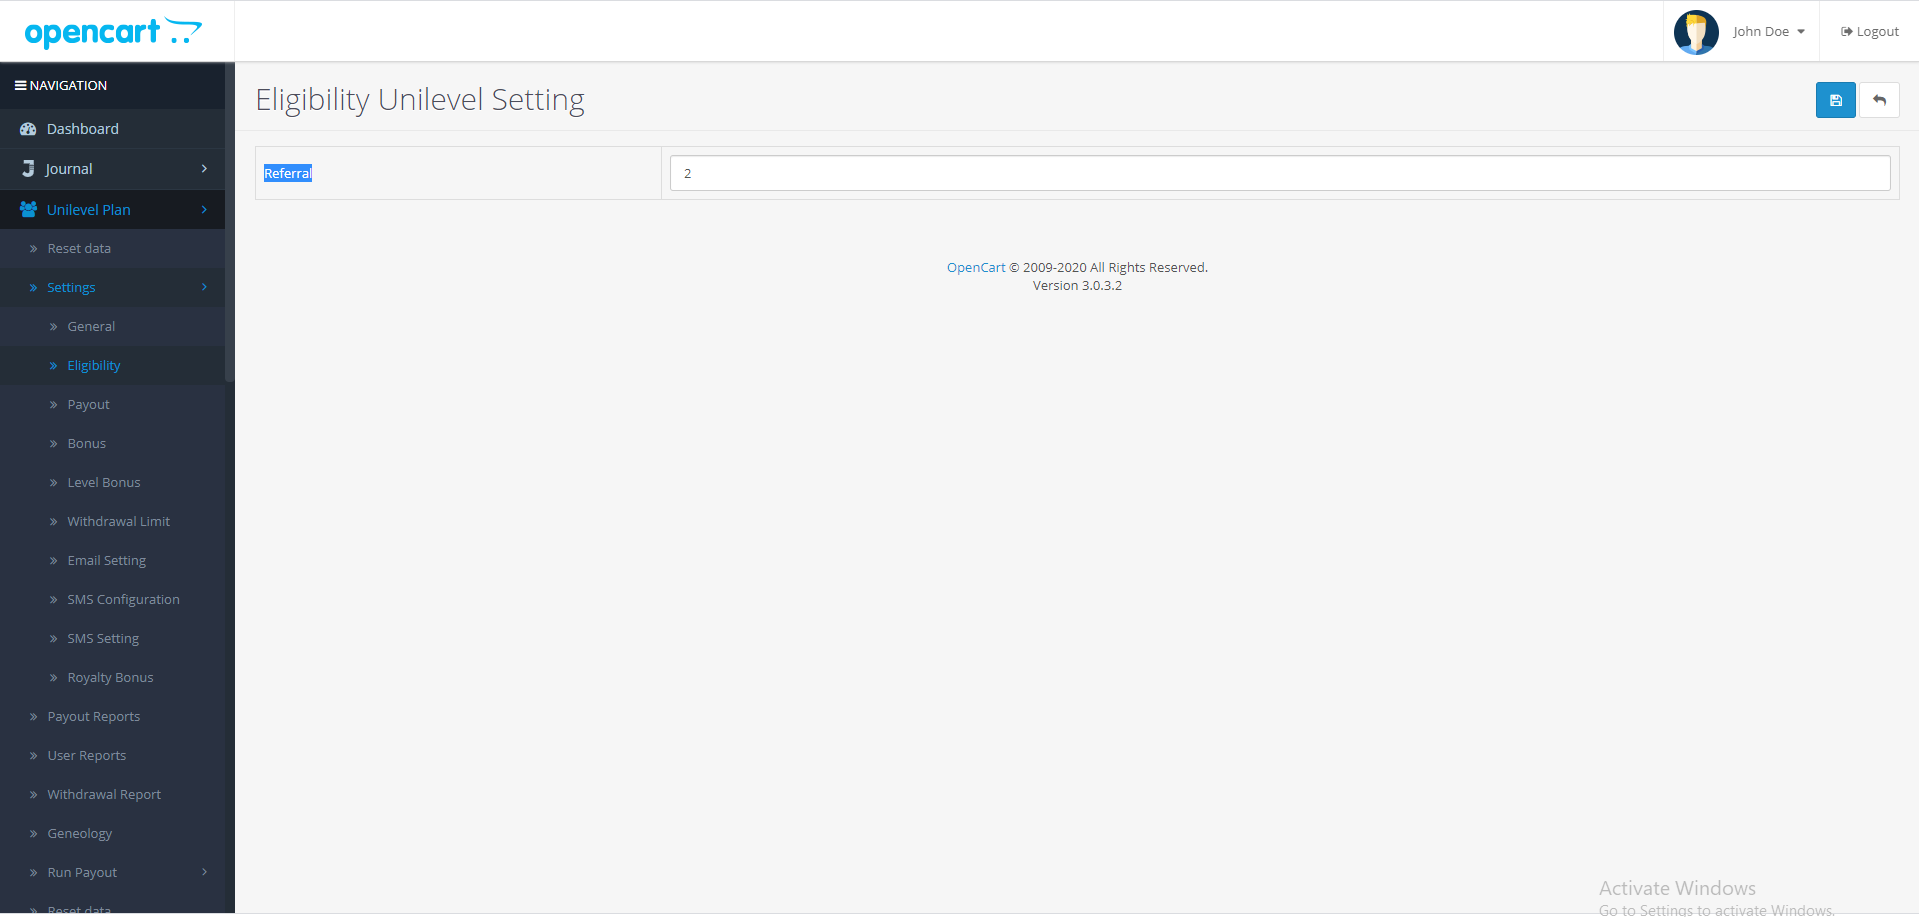 |'Opencart'| |'letscms'| |'opencart unilevel mlm plan'| |'eligibility'| |'Dashboard'| |'unilevel mlm plan'| |'mlm'| |'mlm Plan'|  |'setting'| |'new users'| |'unilevel'| |'unilevel mlm extension'| |'costomer list'| |'new users'| |'Installer'| |'mlmtrees.com'| |'mlm plan'| |'extension'| |'Opencart mlm plan'|